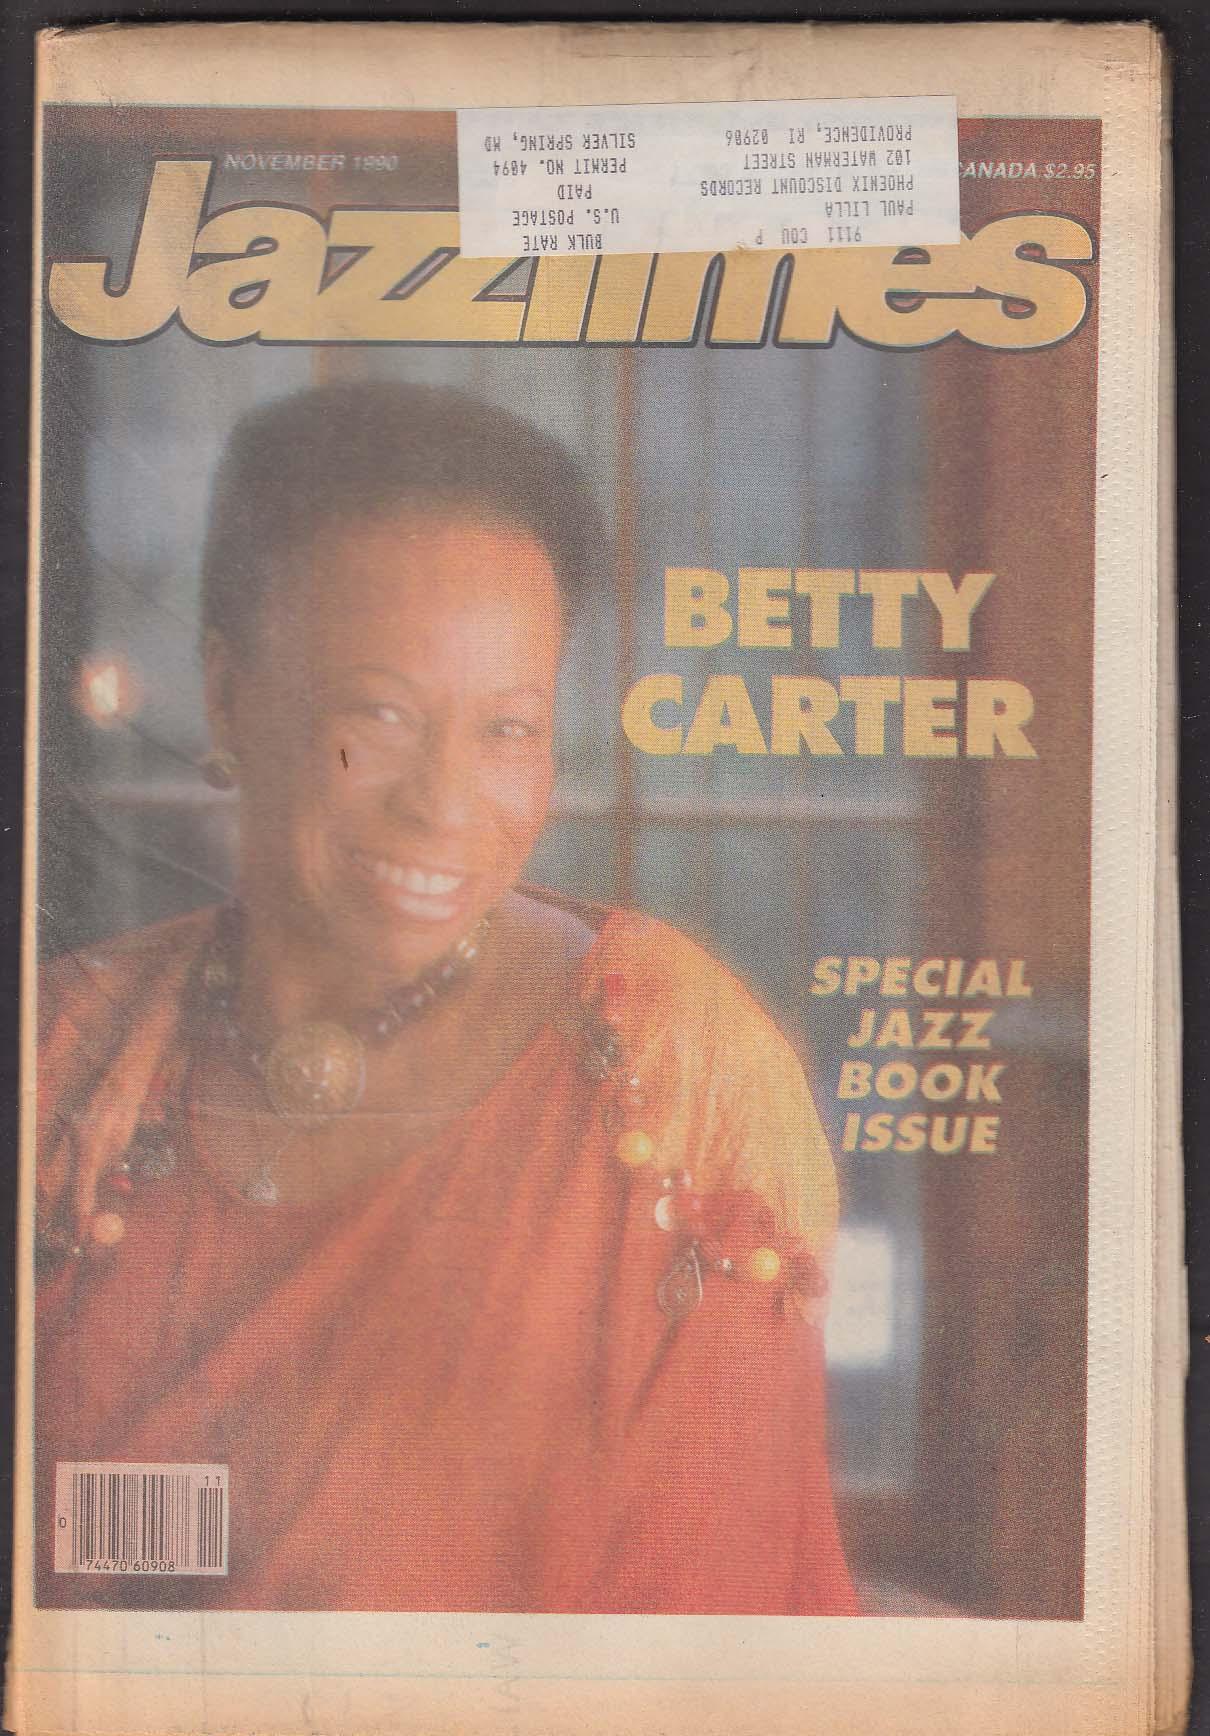 JAZZTIMES Betty Carter Ernestine Anderson Chick Corea ++ 11 1990